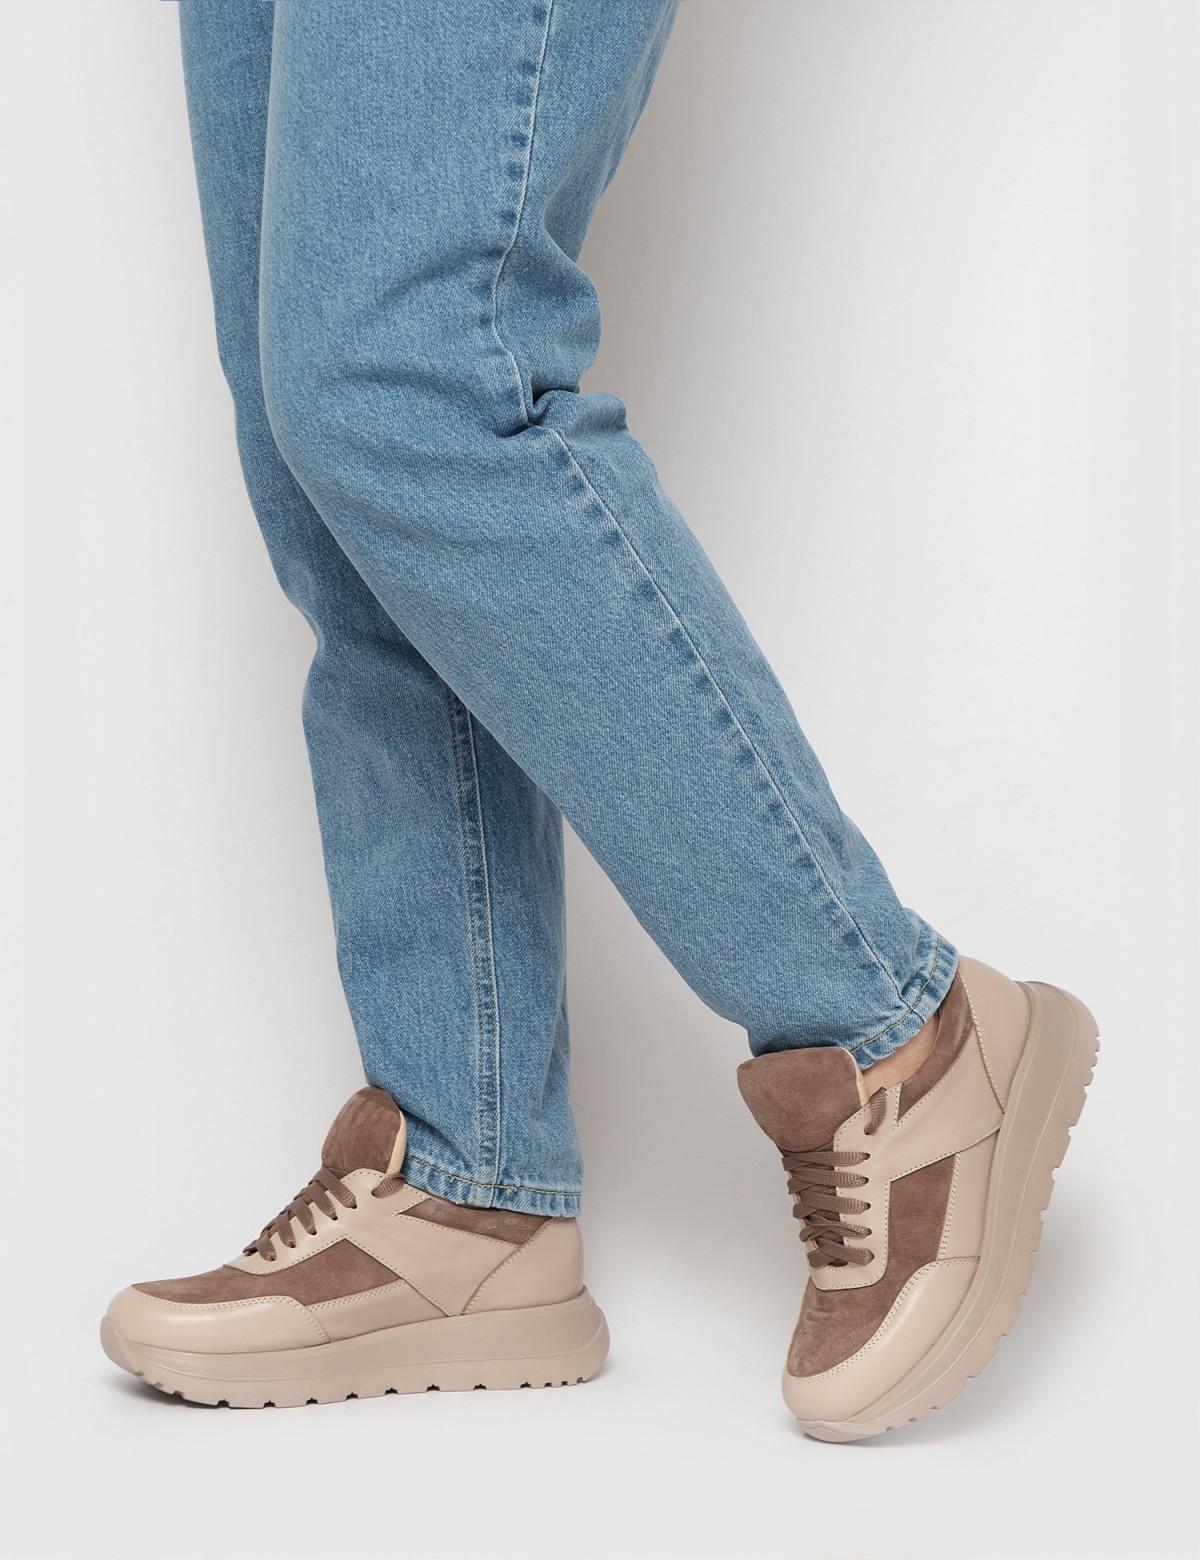 Кросівки бежеві. Натуральна шкіра/замша4